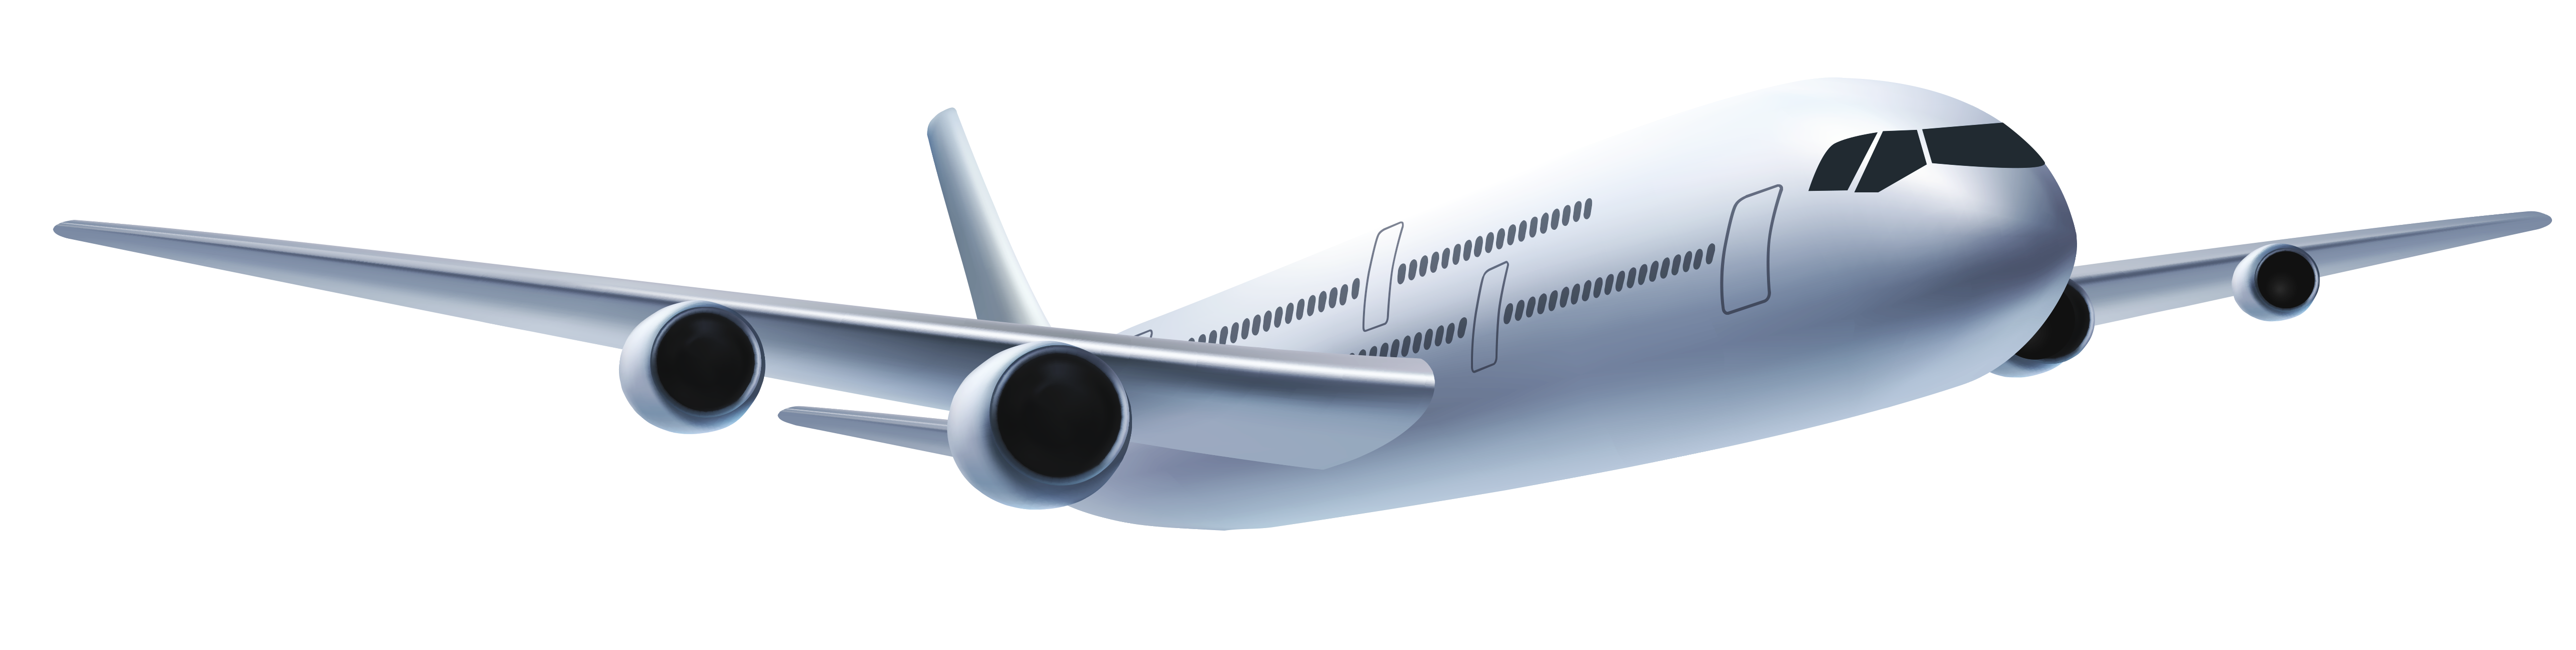 Engine clipart airplane. Plane transparent gallery yopriceville